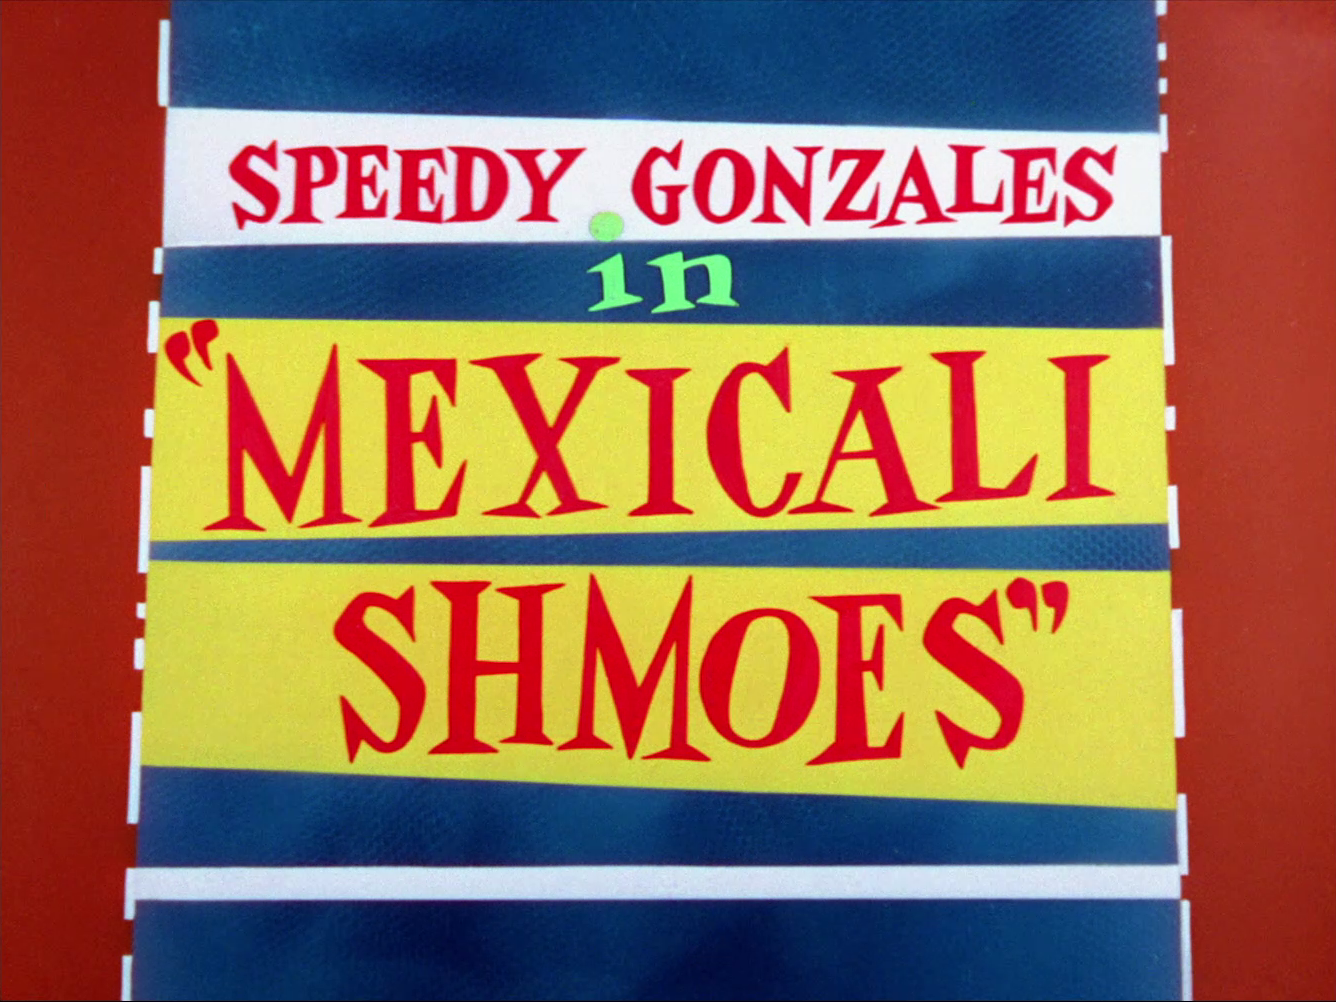 File:Mexicali Shmoes.png